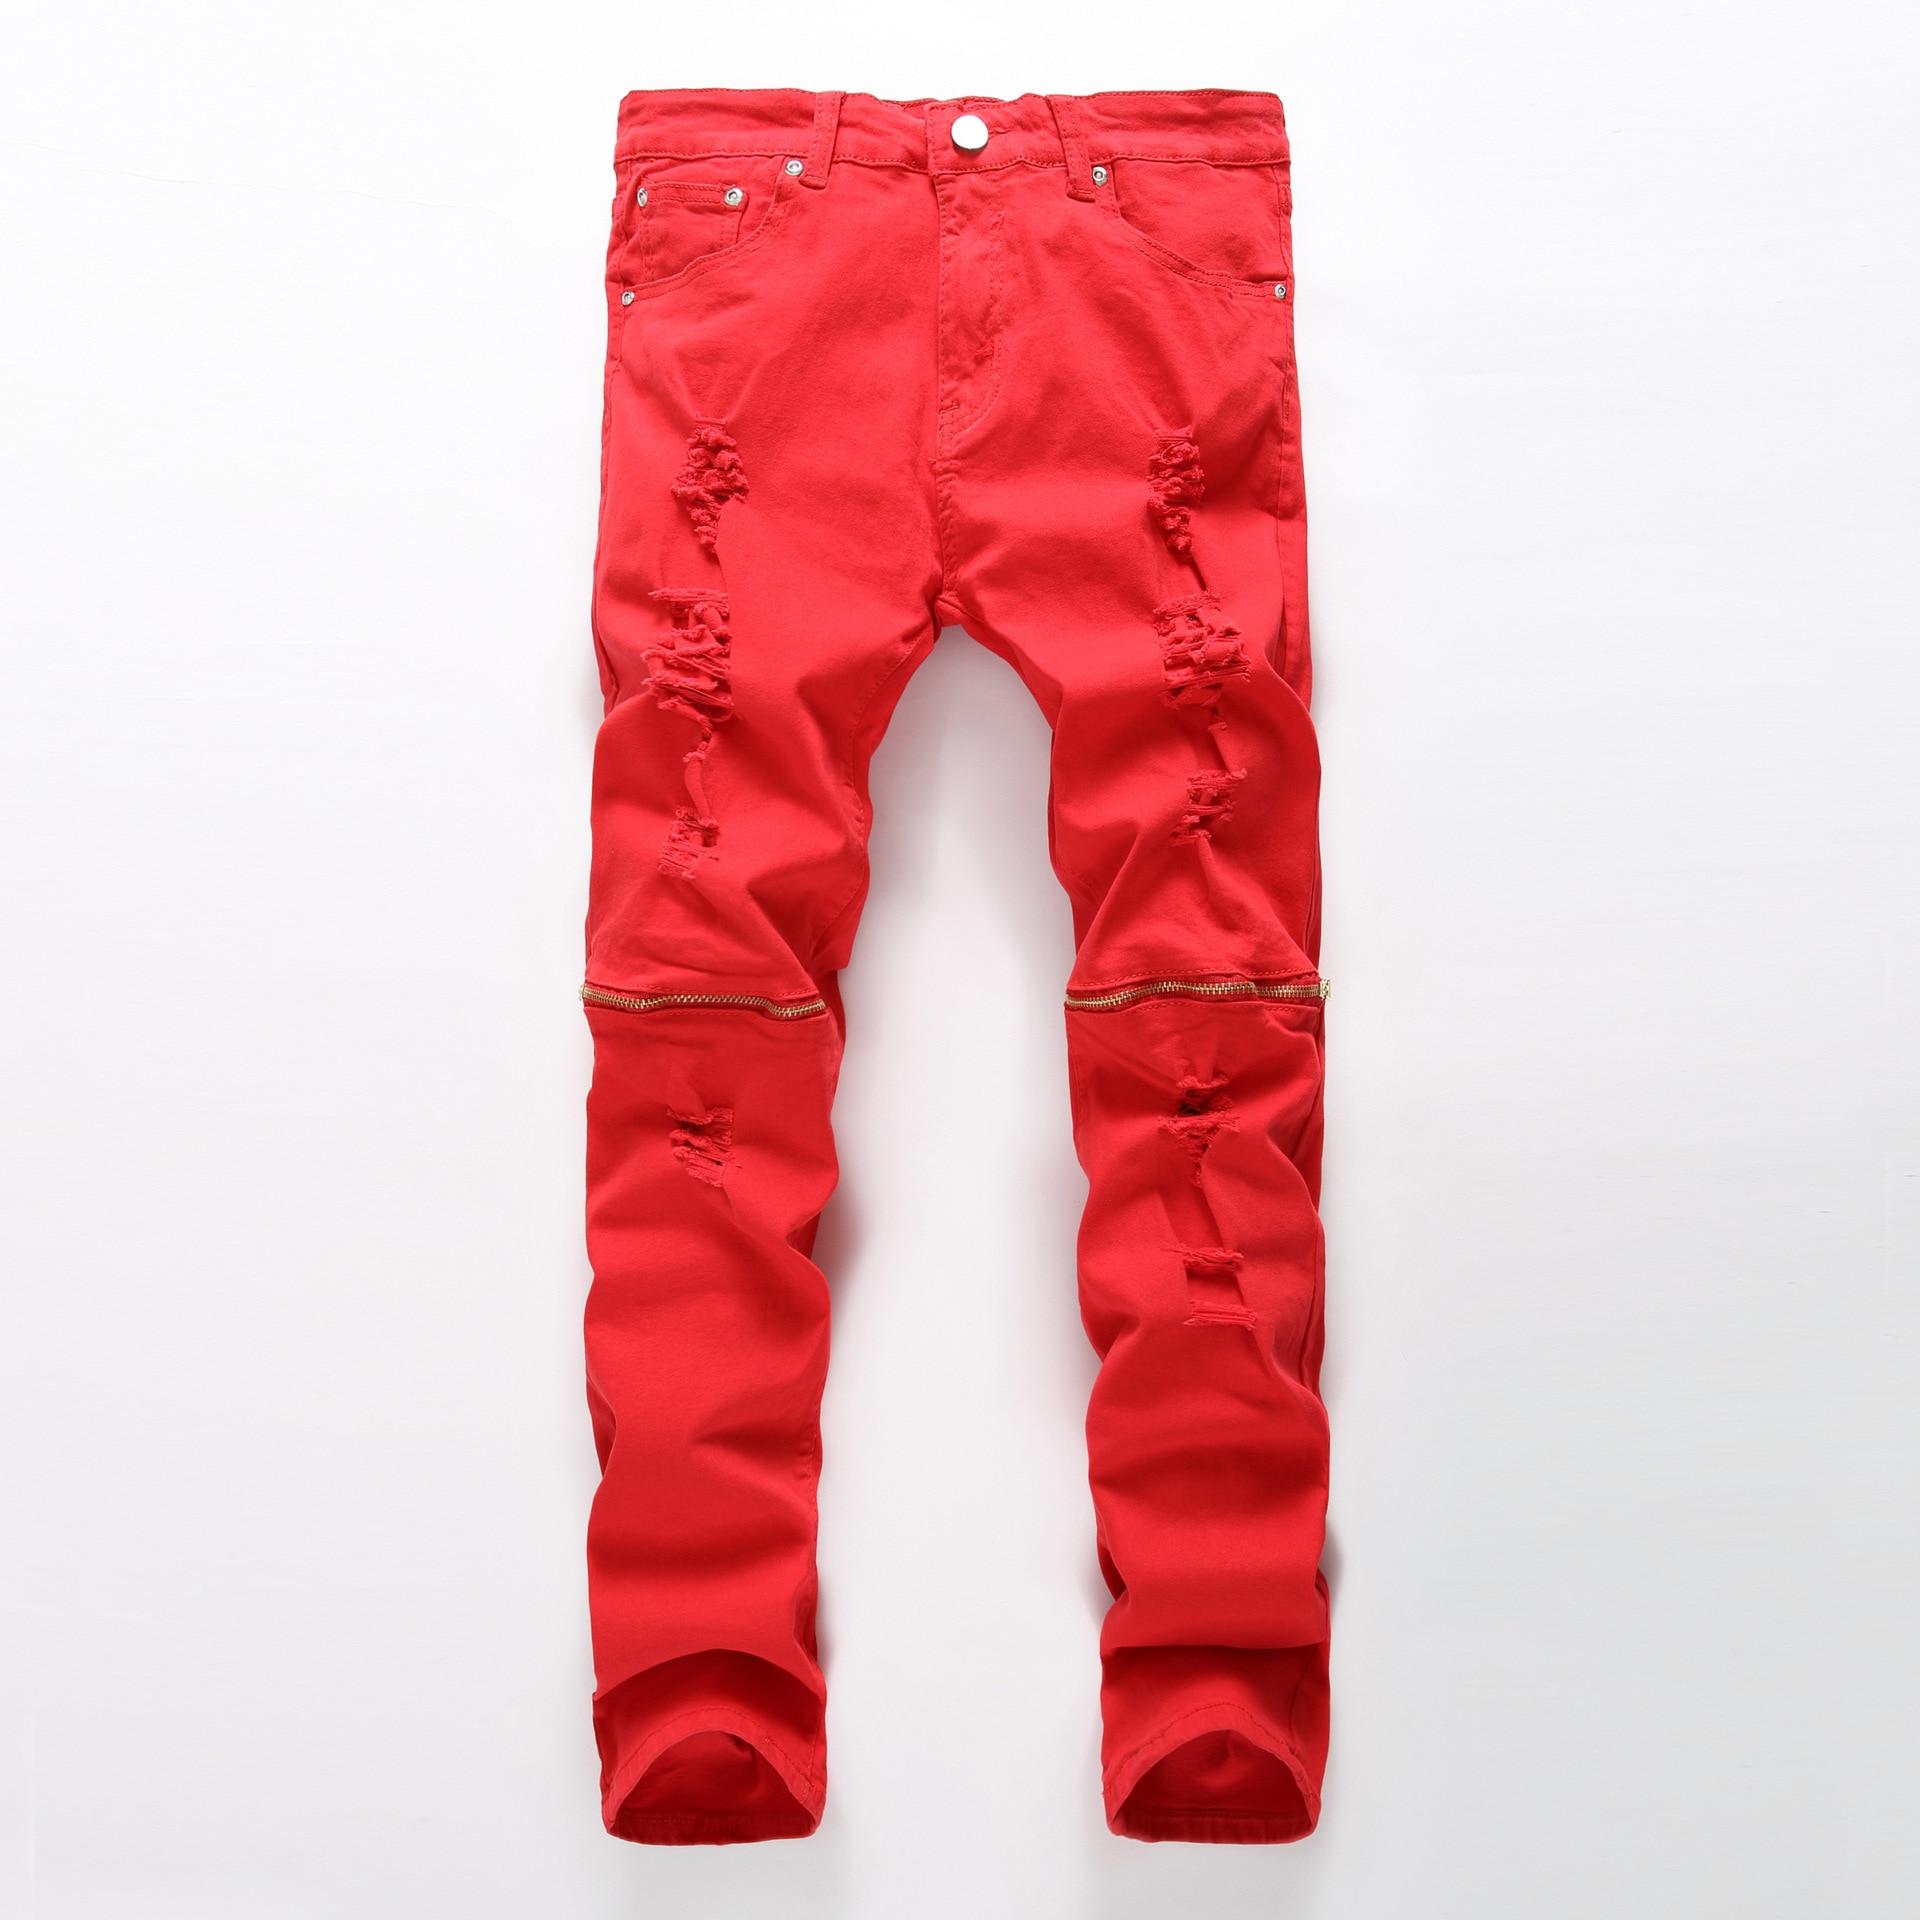 Red zipper decoration Skinny jeans men Ripped jeans Fashion Casual Slim fit Biker jeans Hip hop Denim elastic cotton trousers